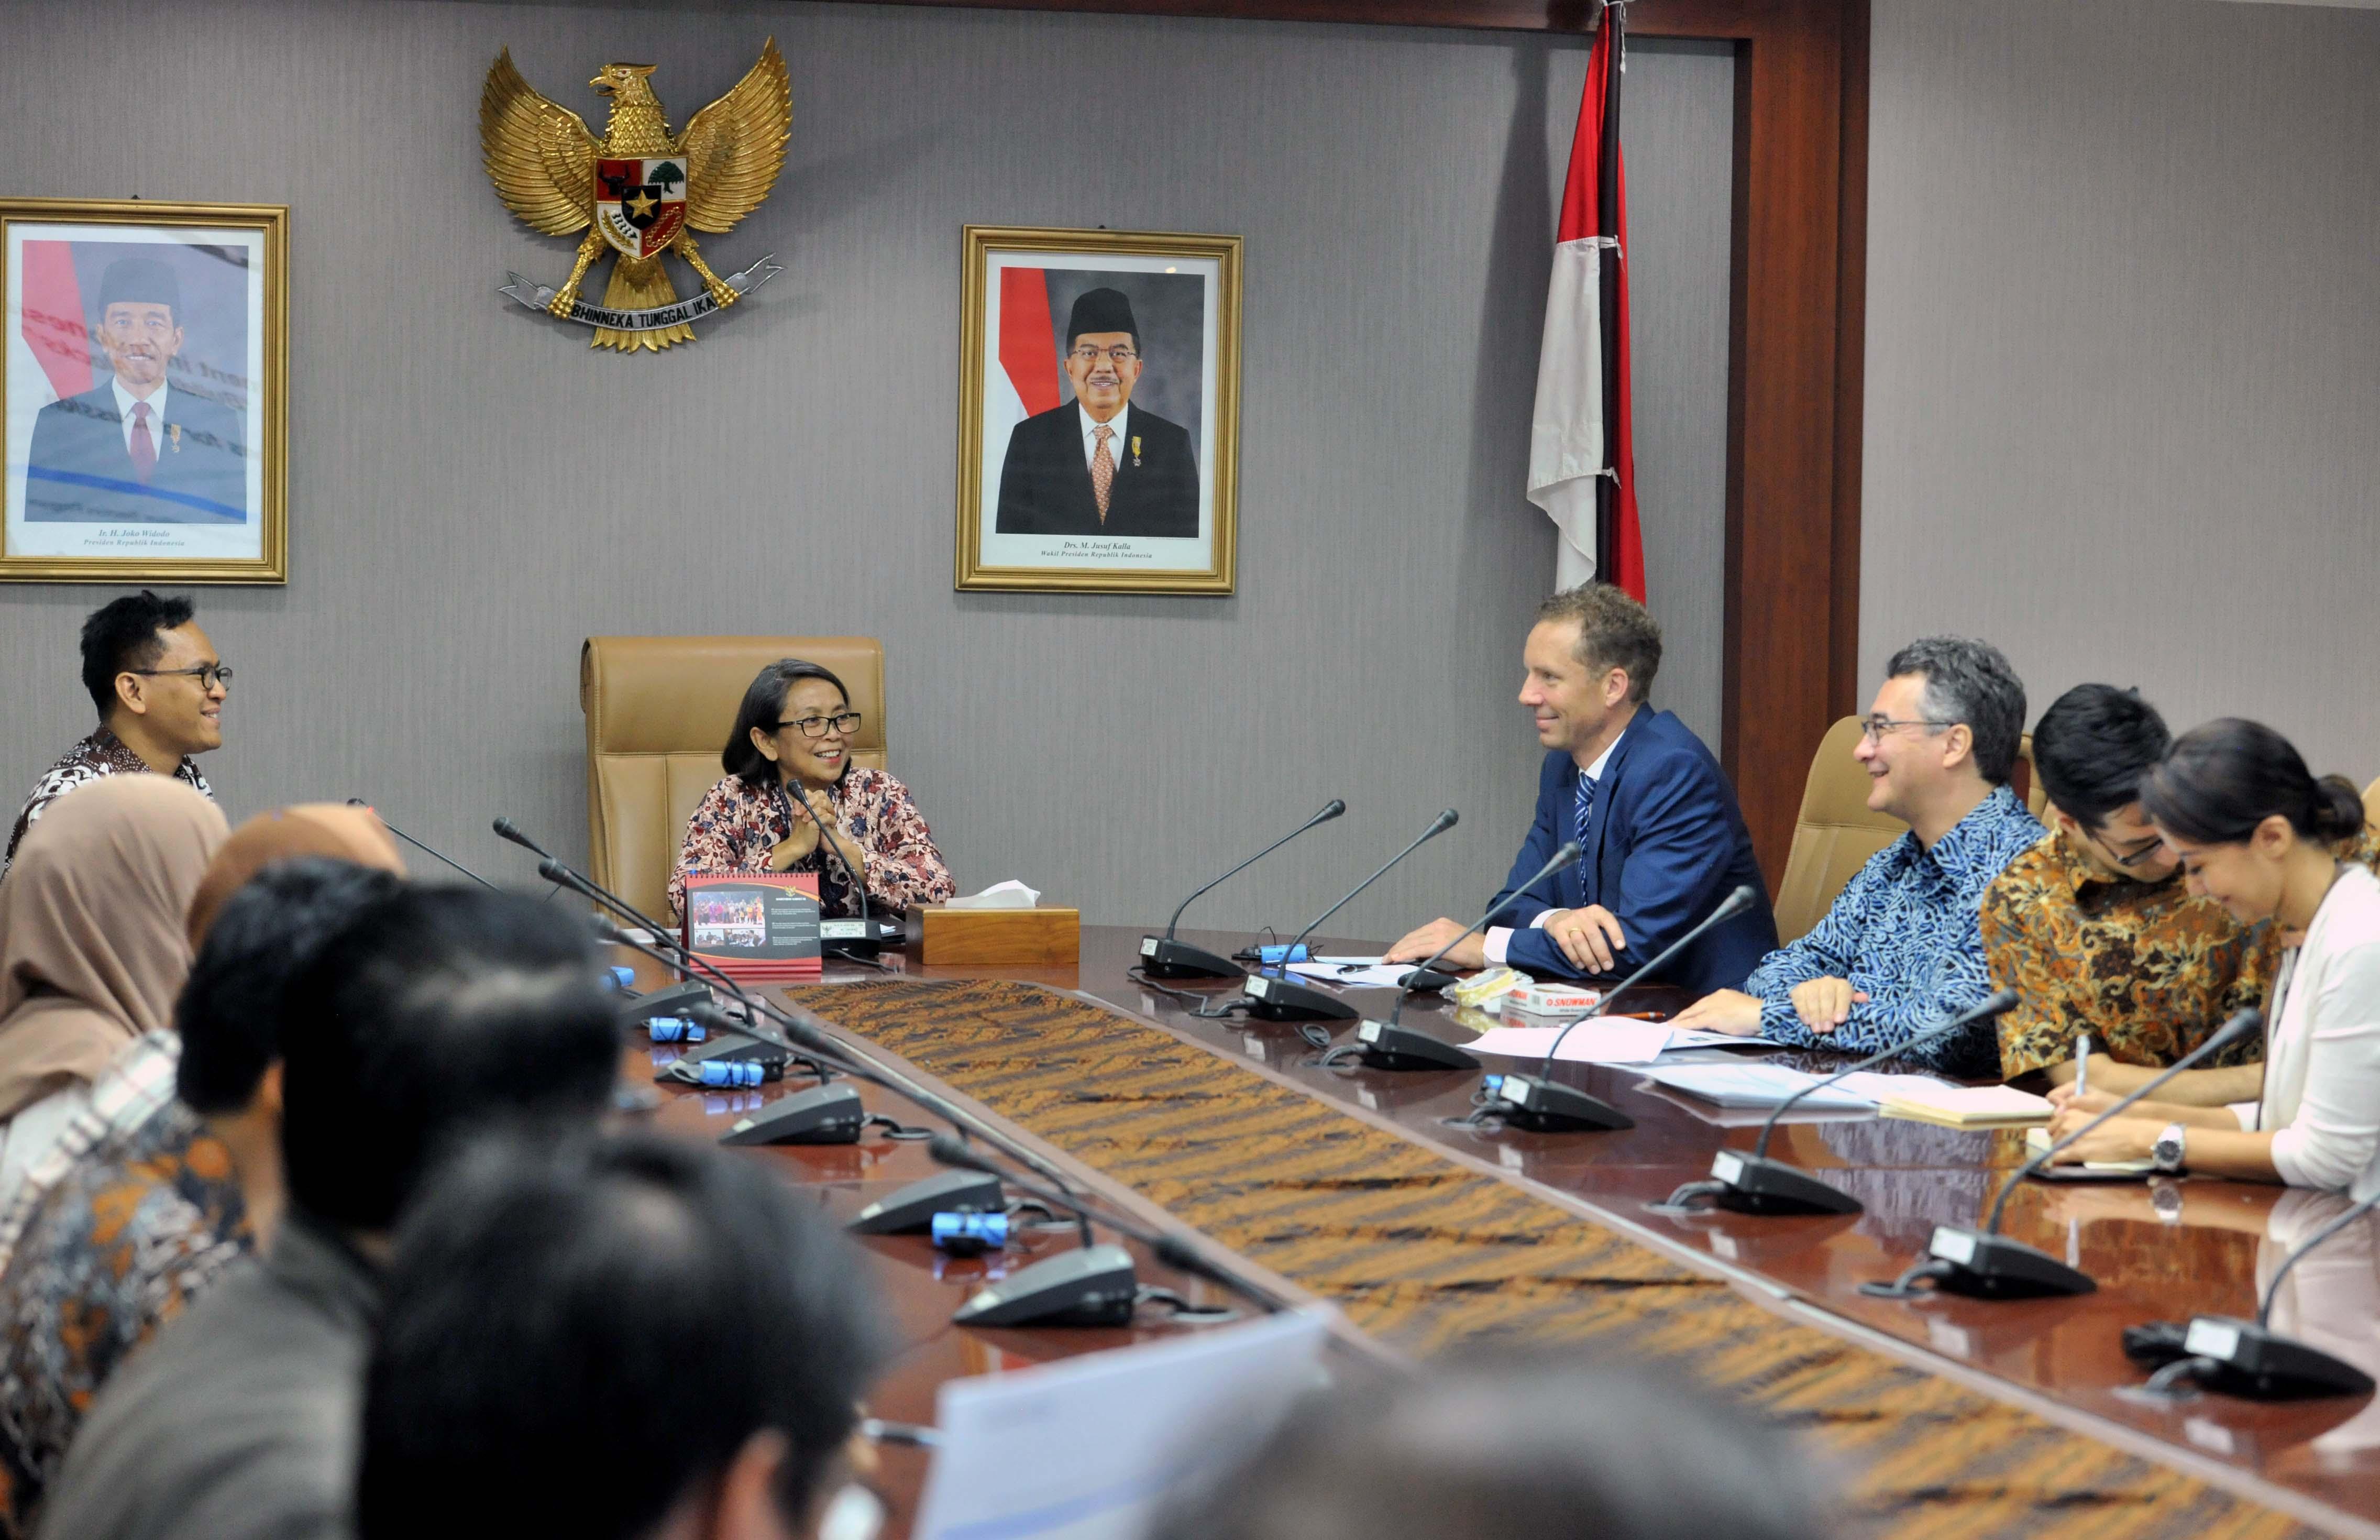 Samakan Persepsi, Kedeputian Maritim Setkab Diskusikan 'Regulatory Governance System'